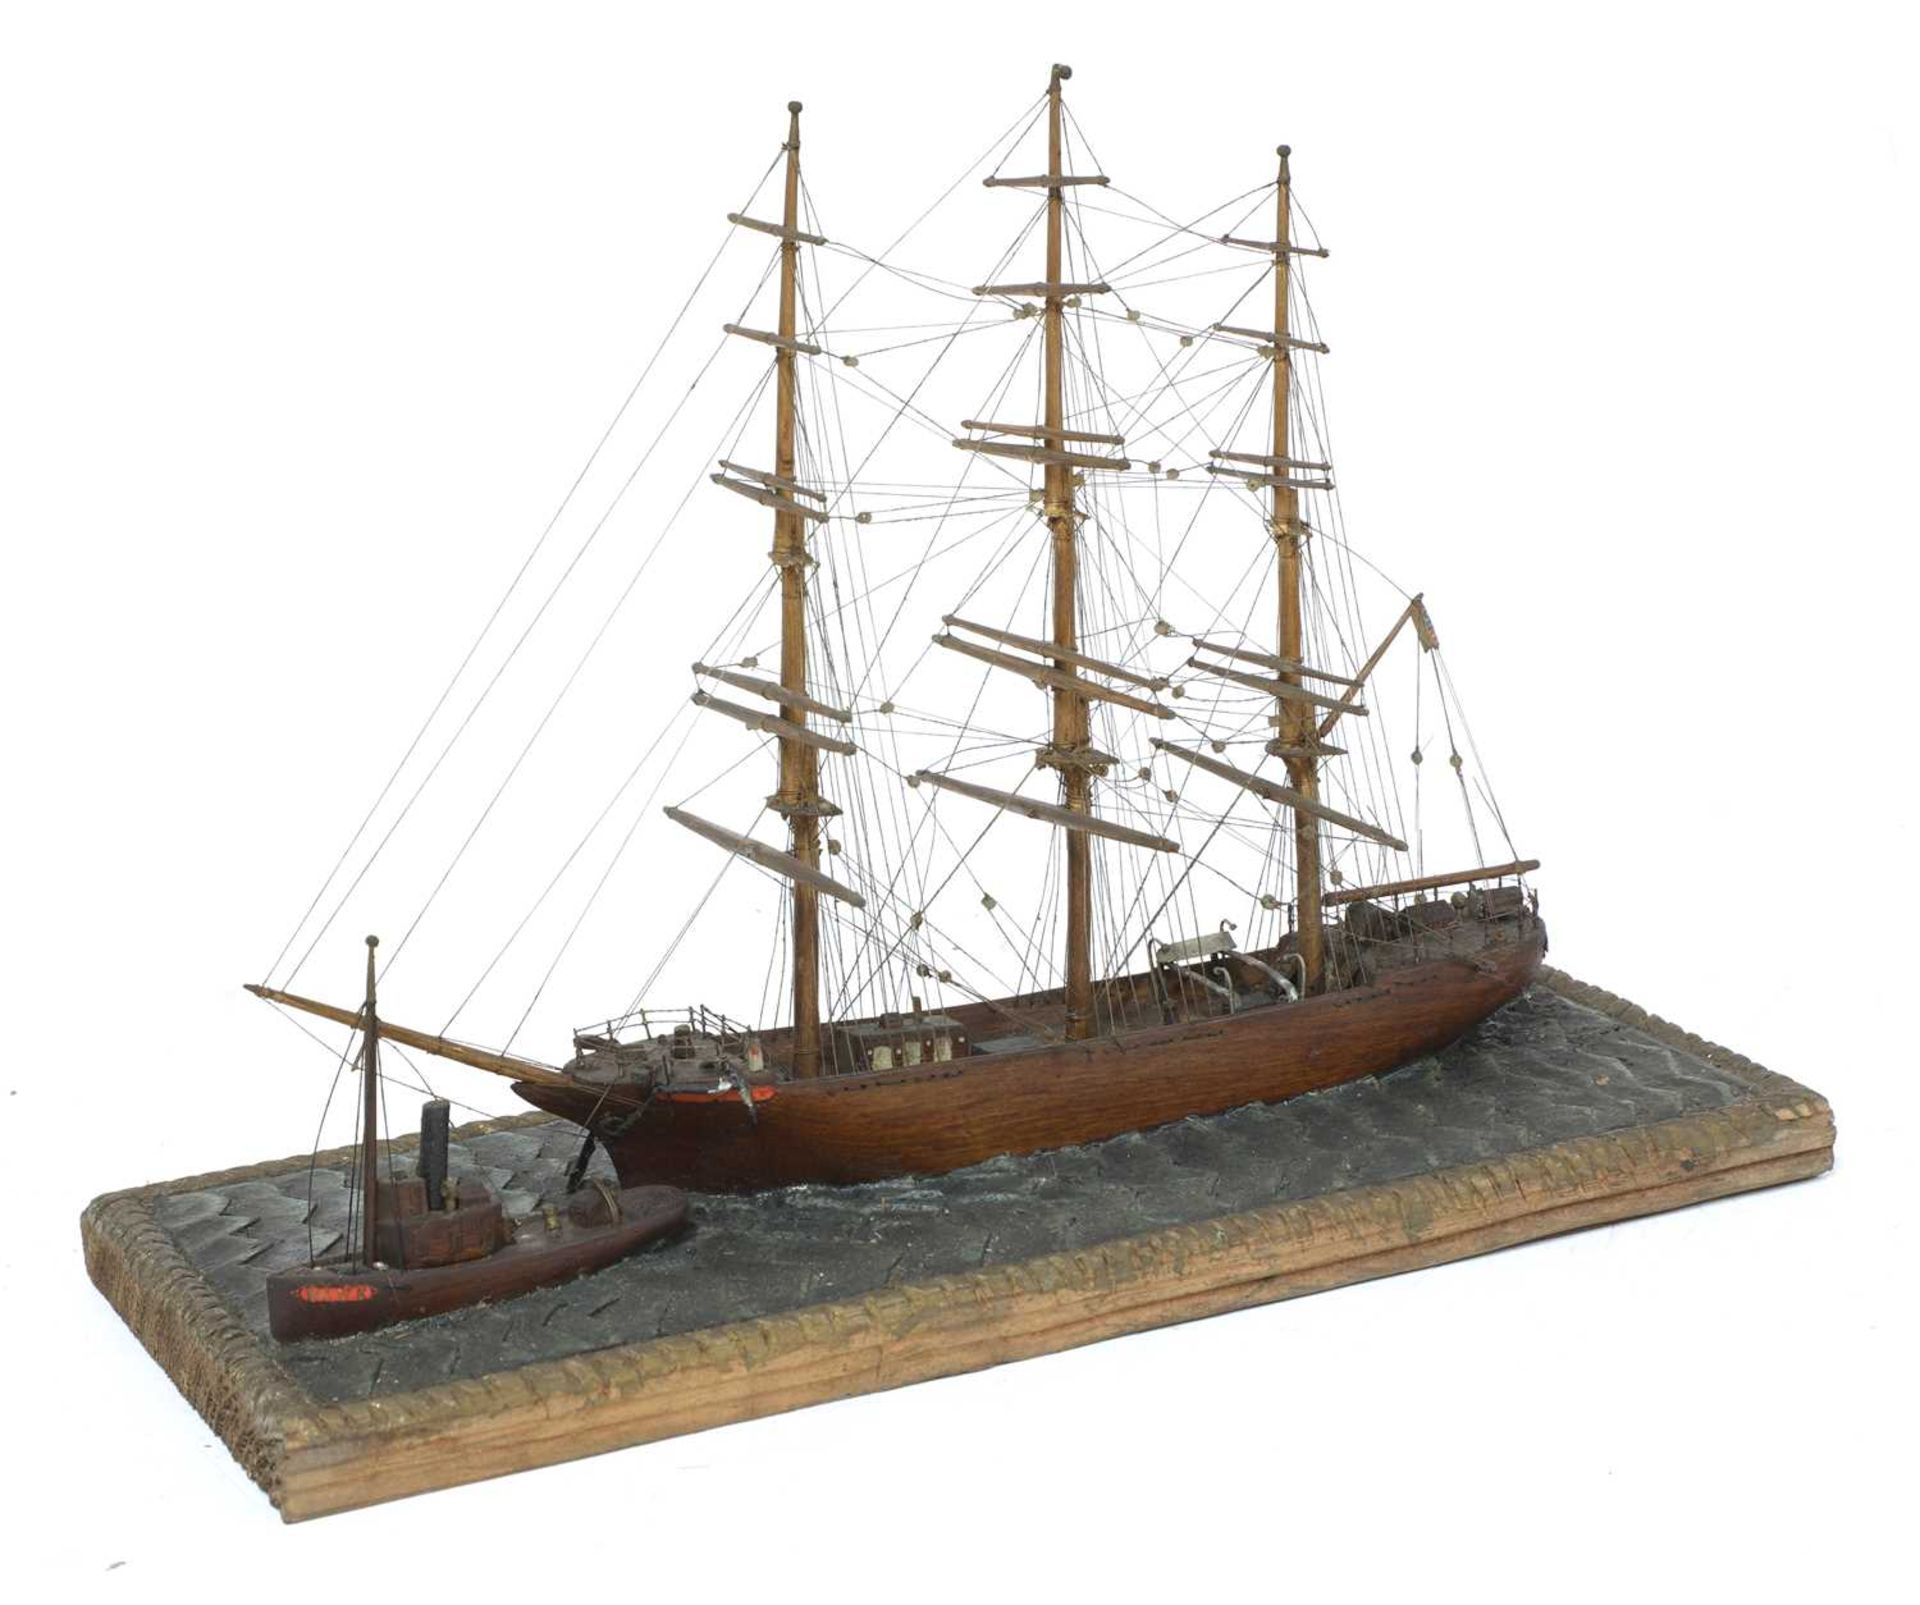 A North American scratch built, folk art, ship model, - Image 3 of 6